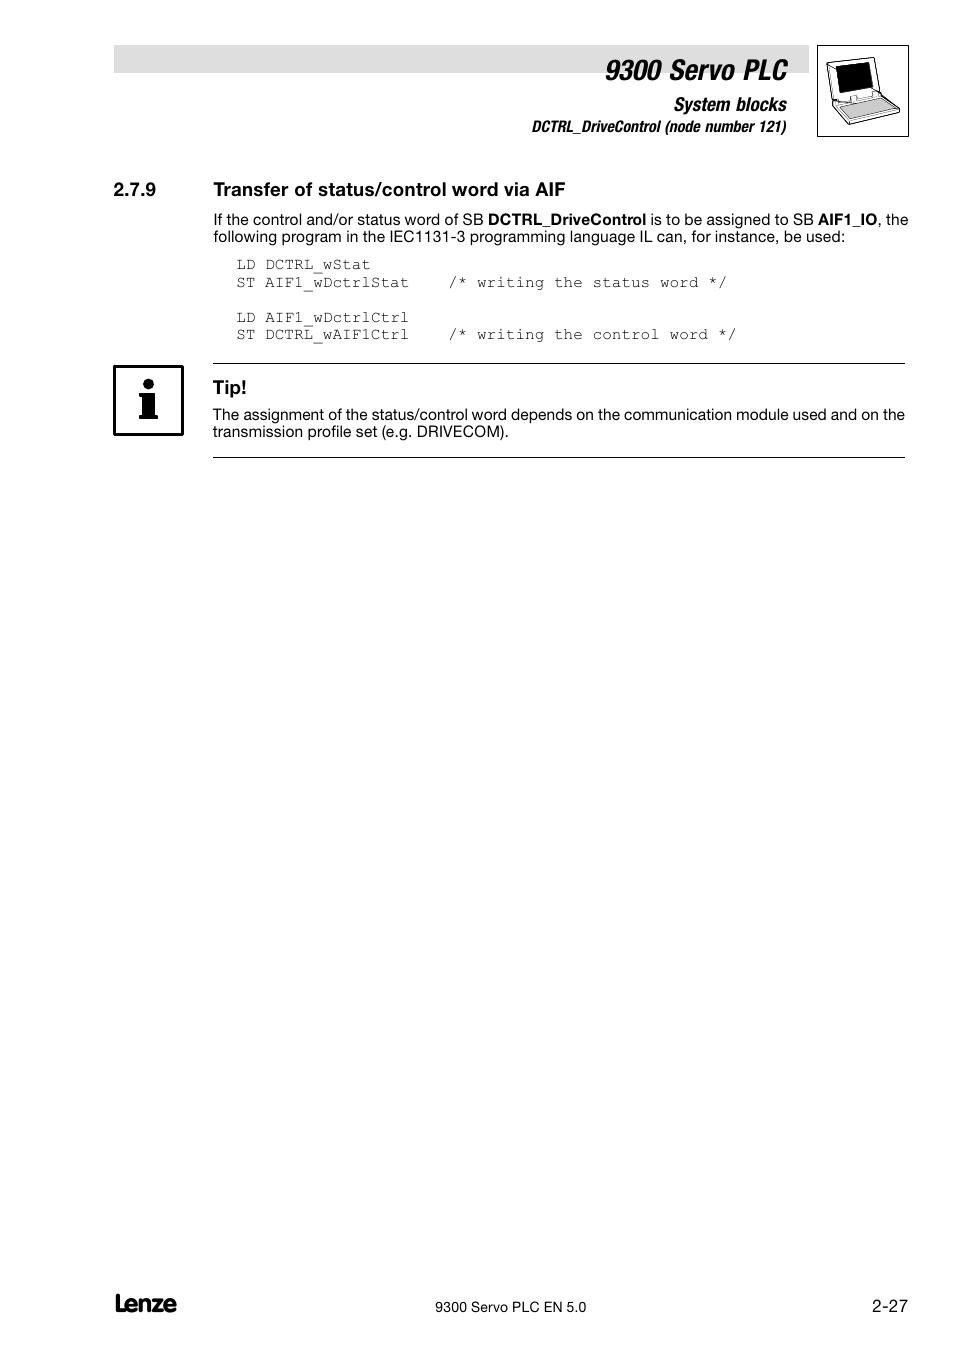 Transfer of status/control word via aif, 9300 servo plc | Lenze